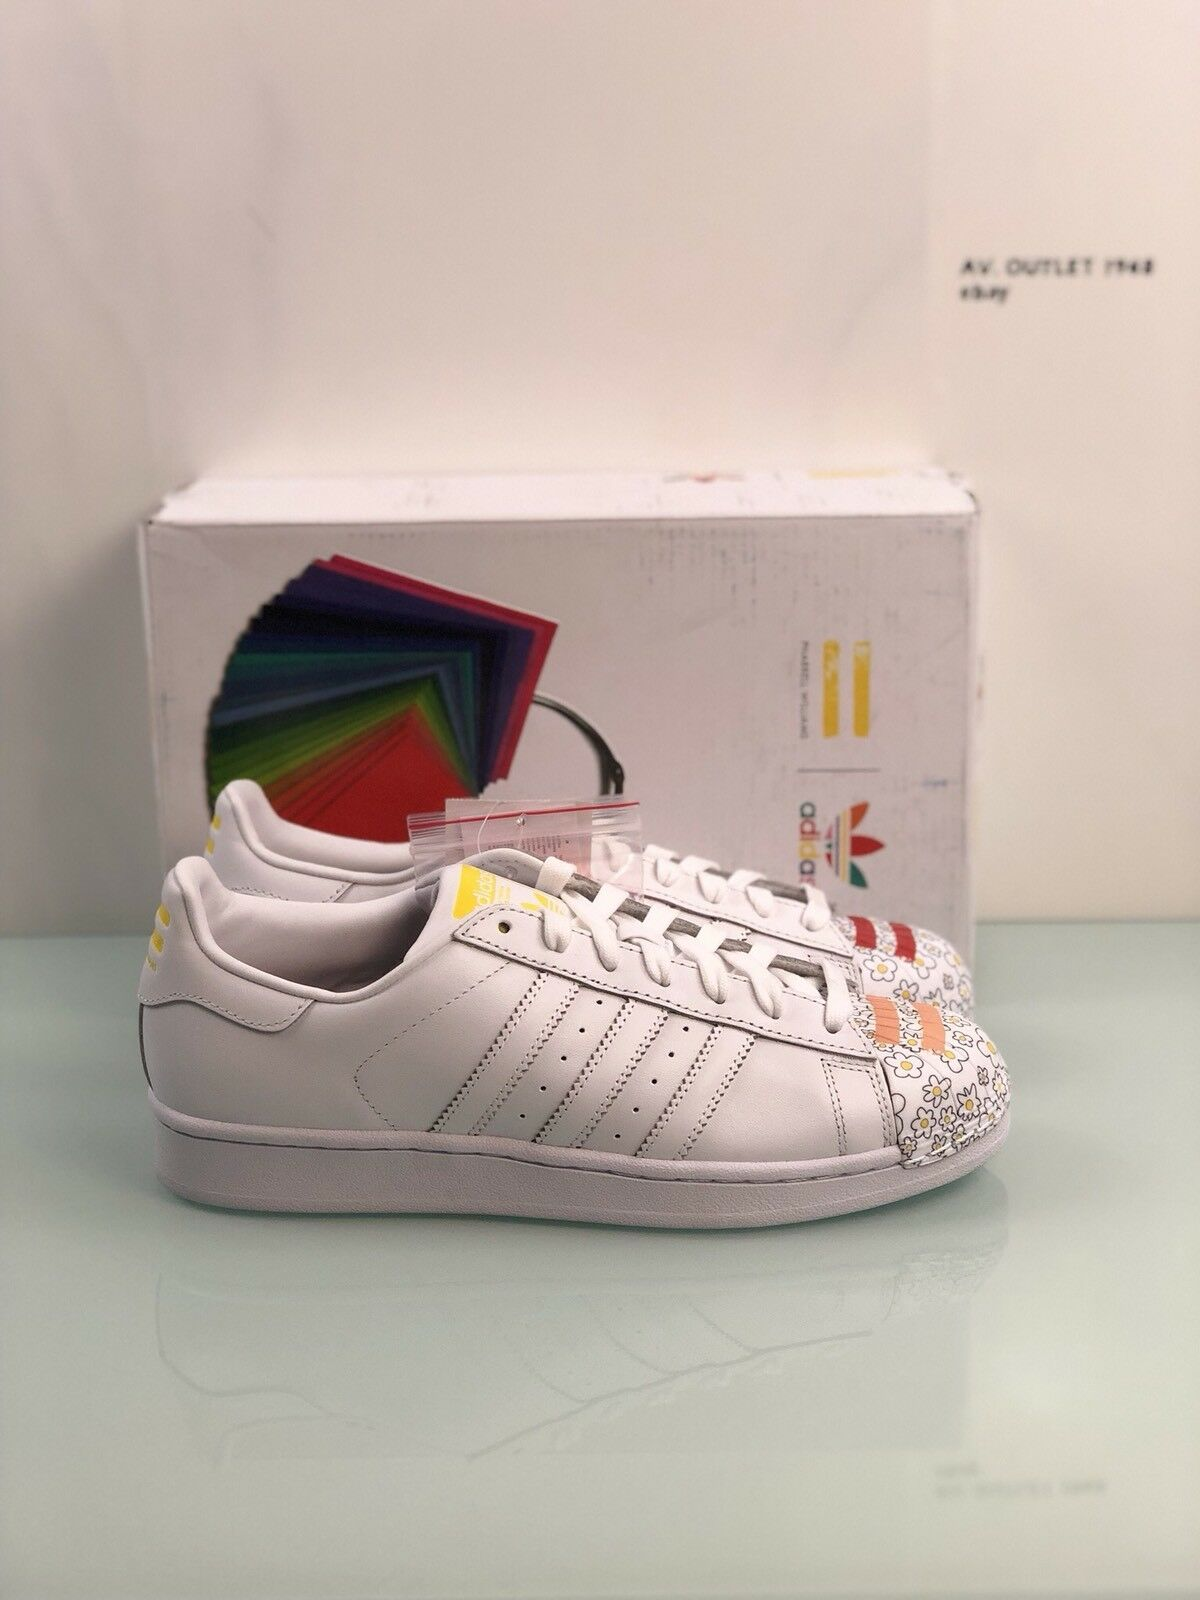 Adidas Super star Pharrell SUPERRSH Basket , , , adidas super star Pharrel 2123ac